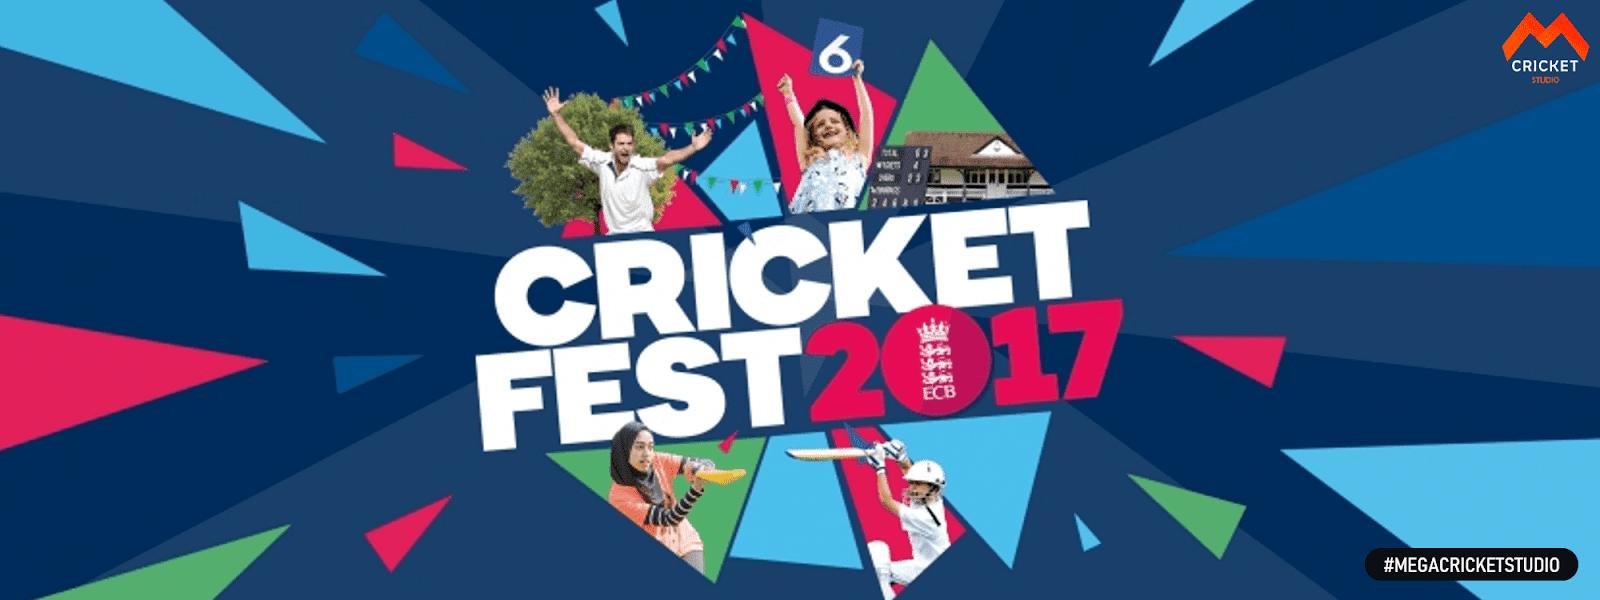 cricket 17 megacricketstudio-min